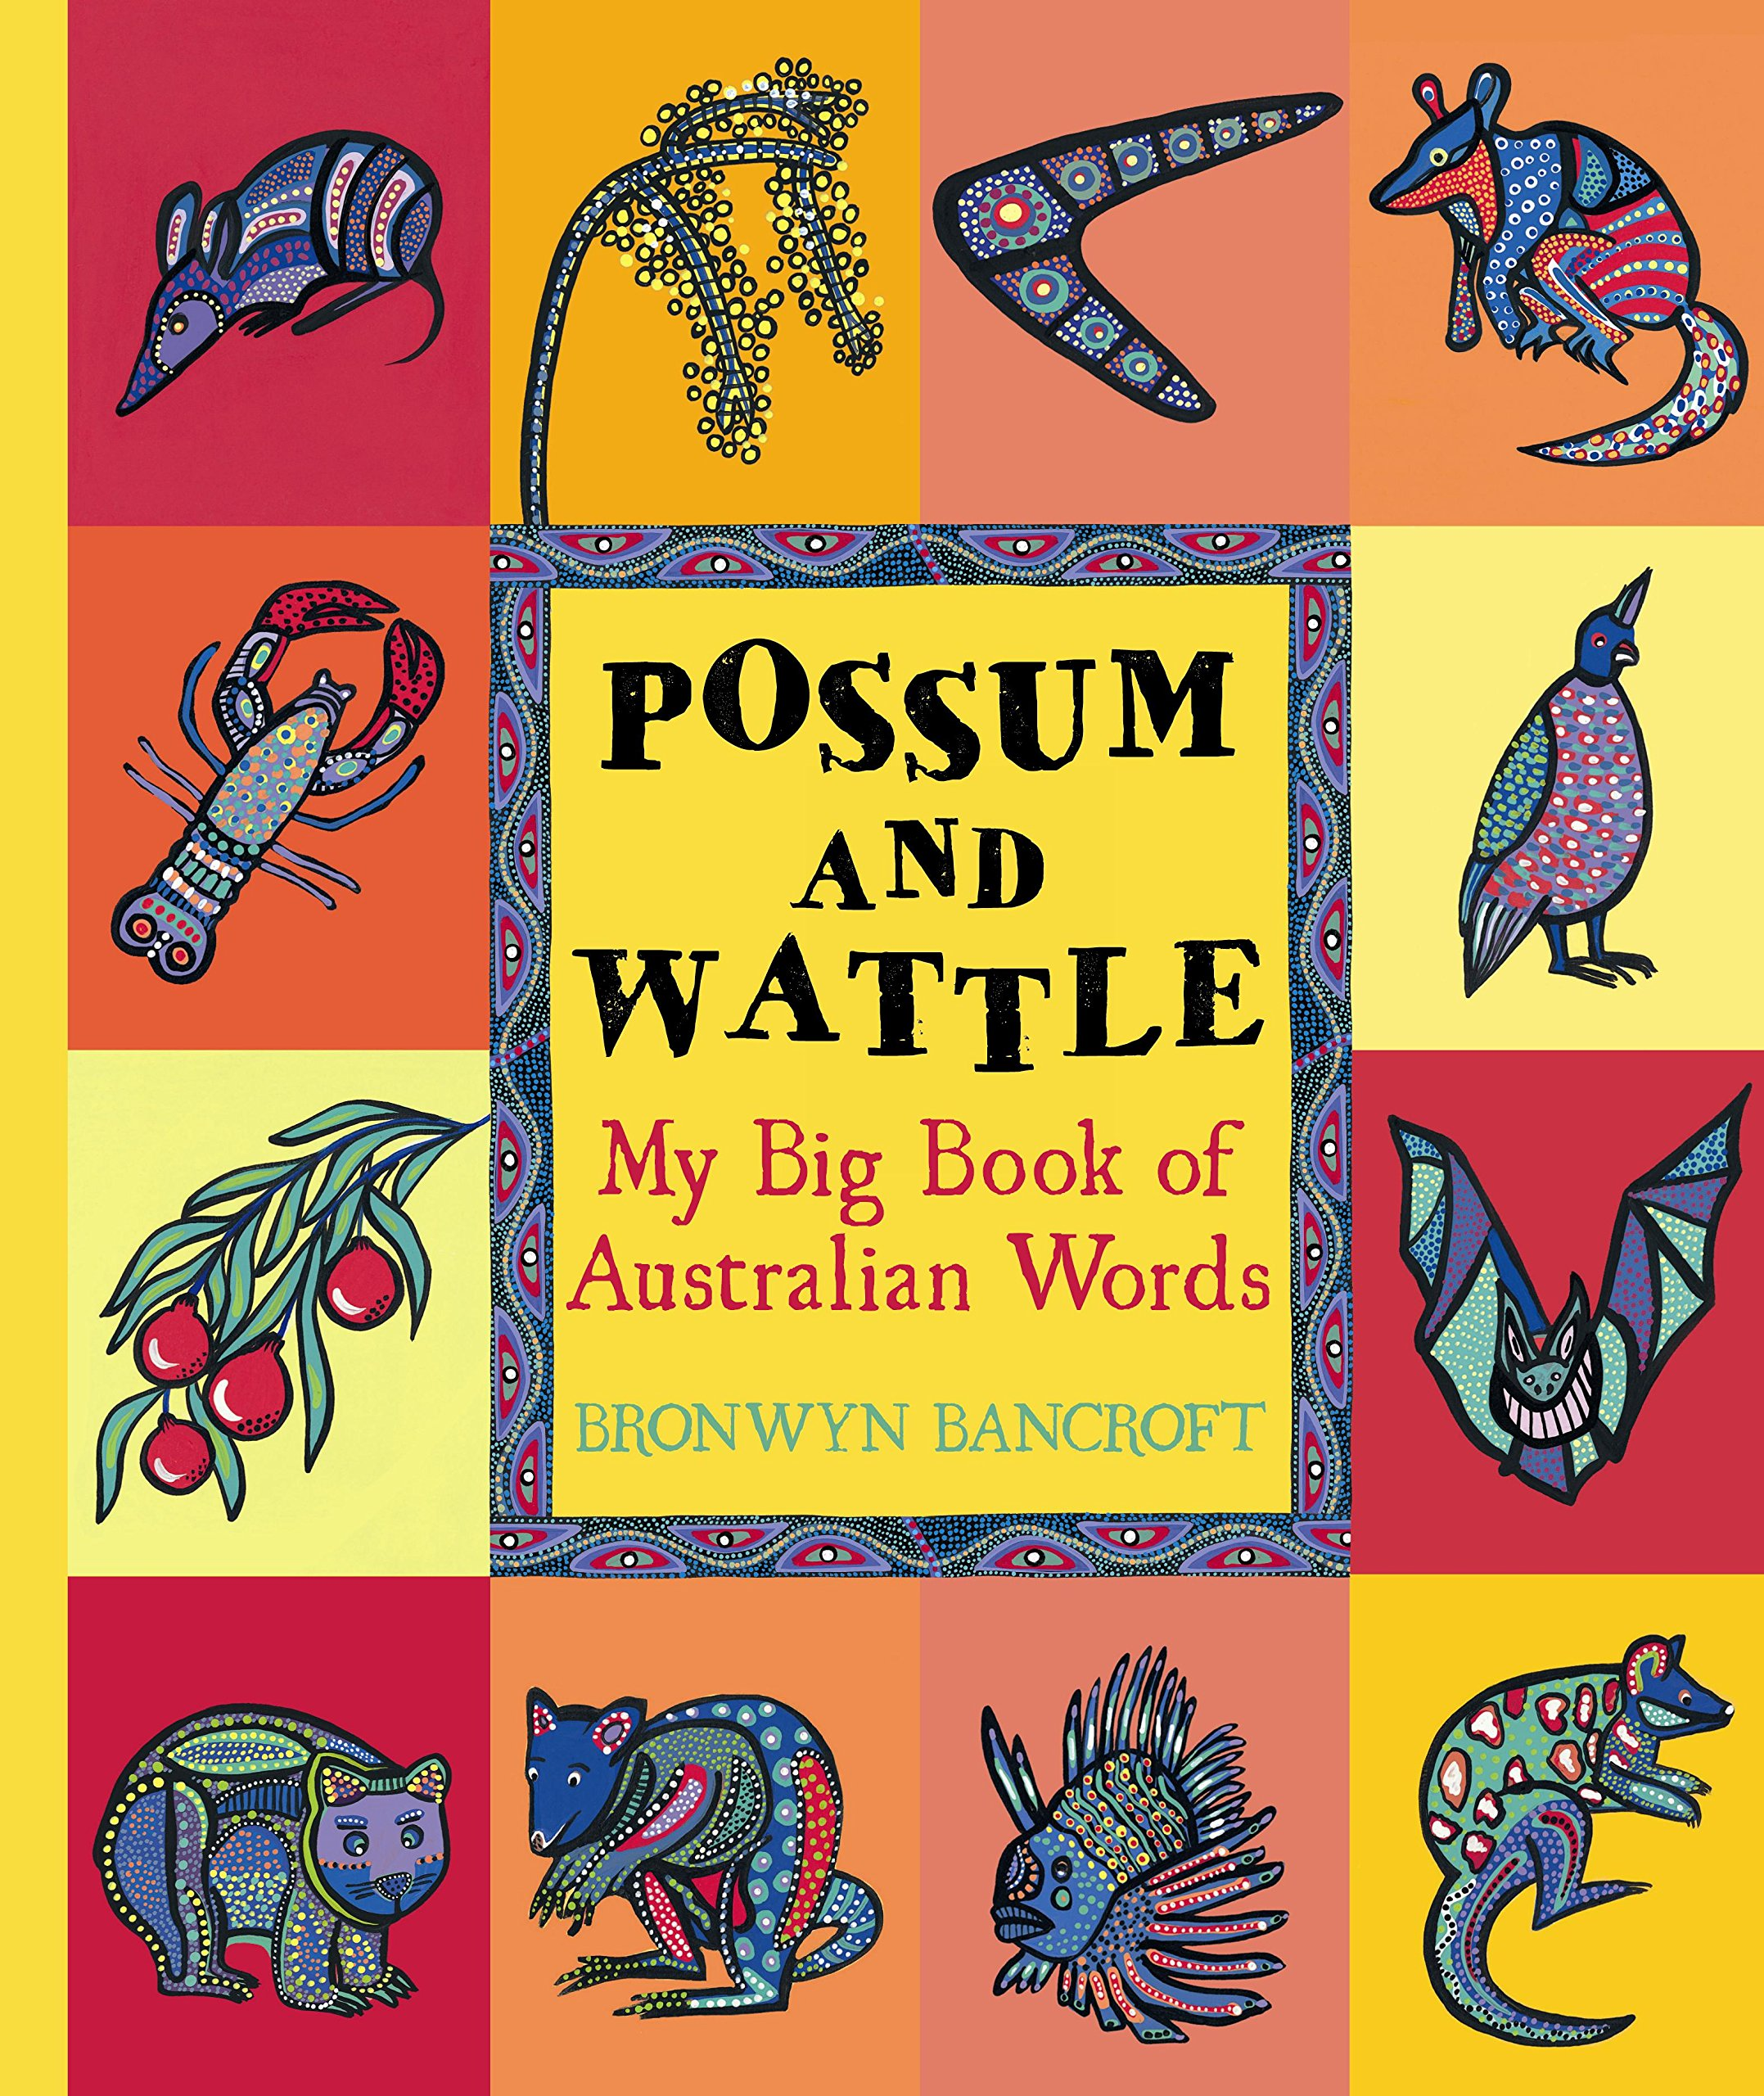 Possum and Wattle: My Big Book of Australian Words Text fb2 ebook